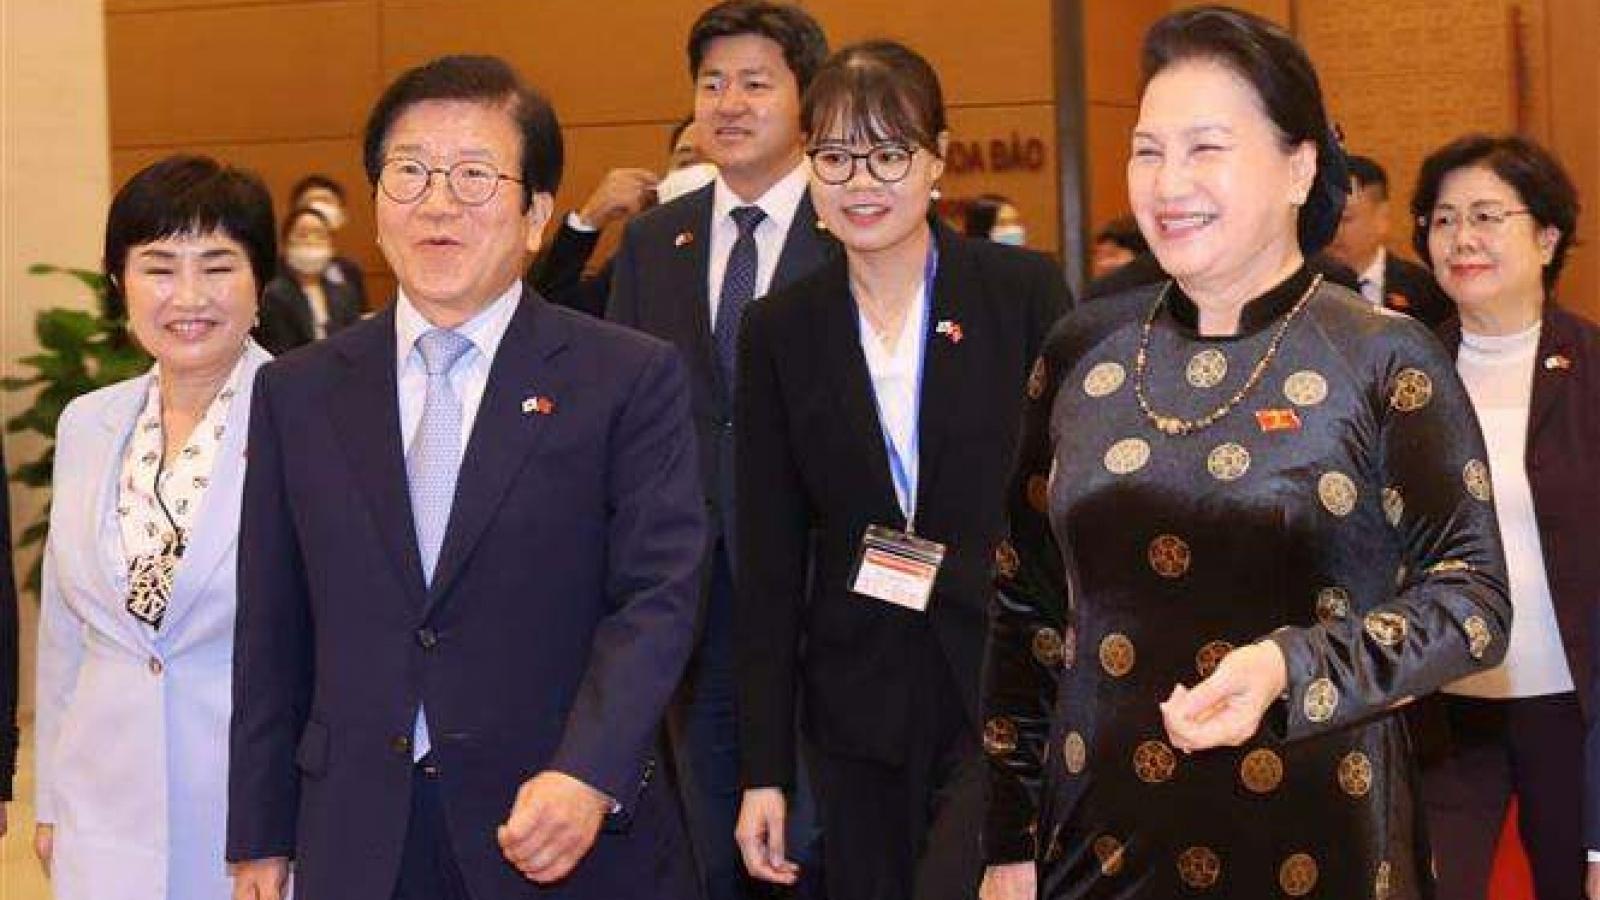 Leading RoK legislator Park Byeong Seug ends Vietnam visit